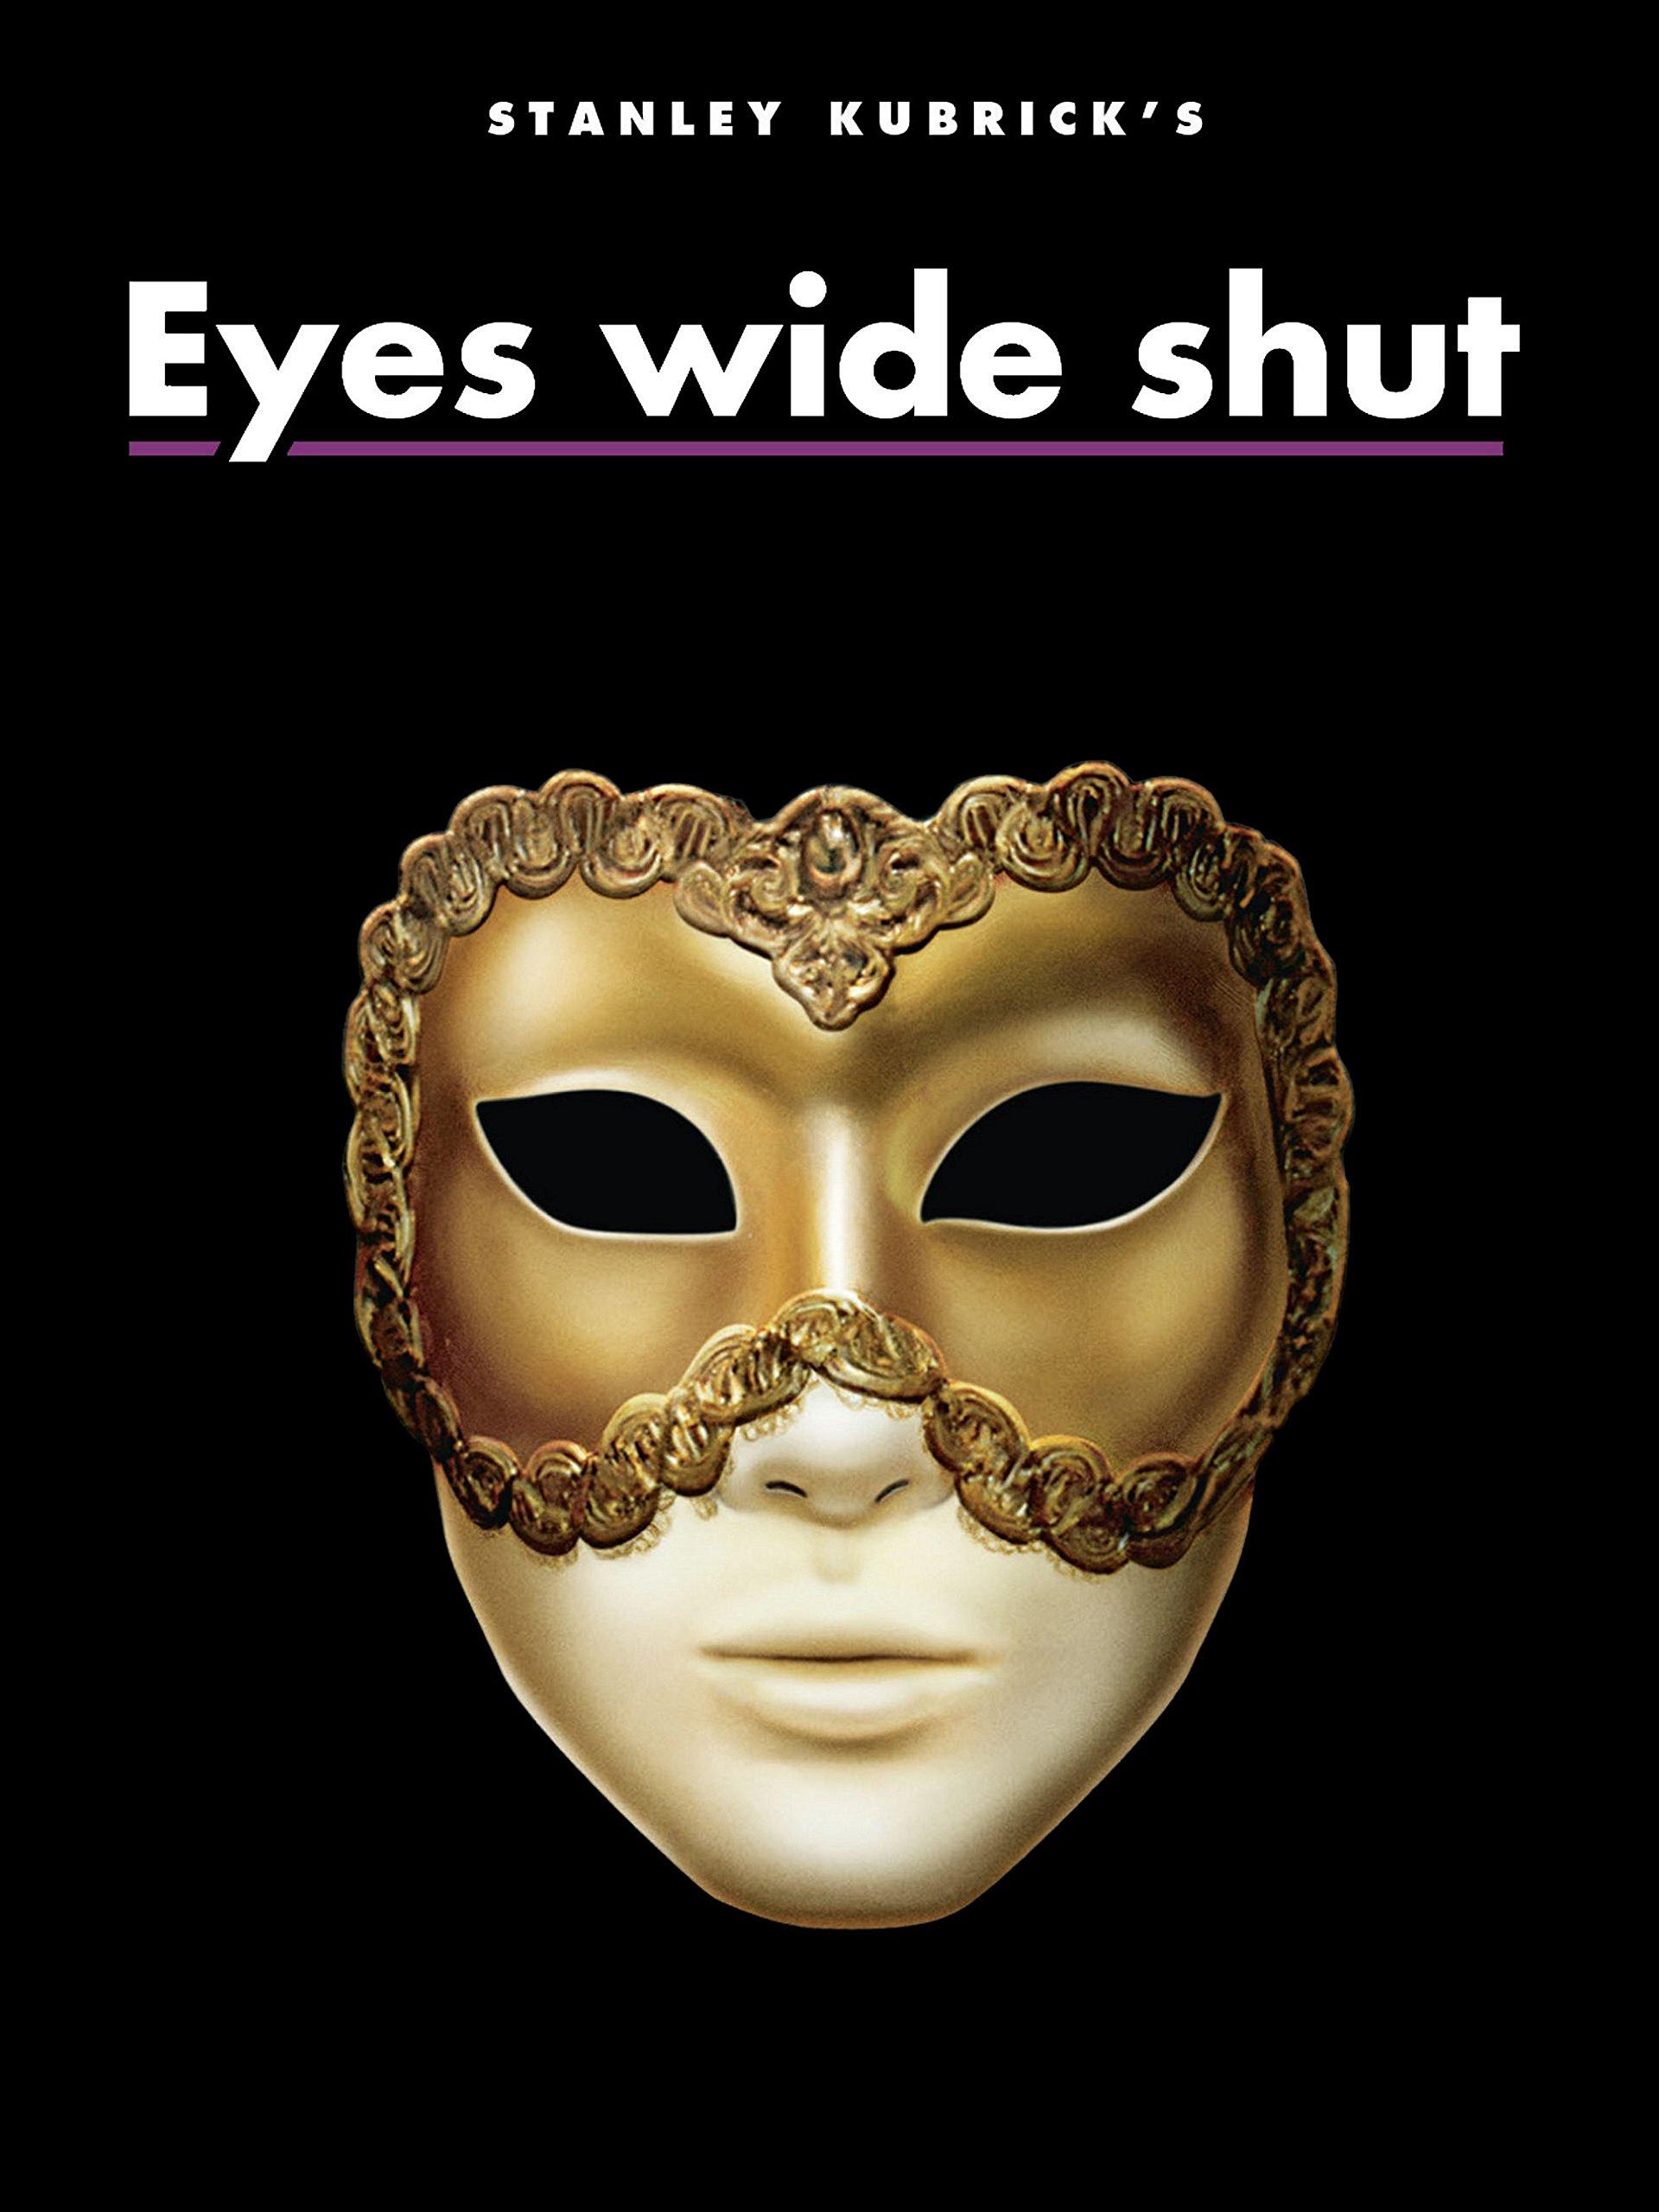 EWS Classic Mask Poster.jpg